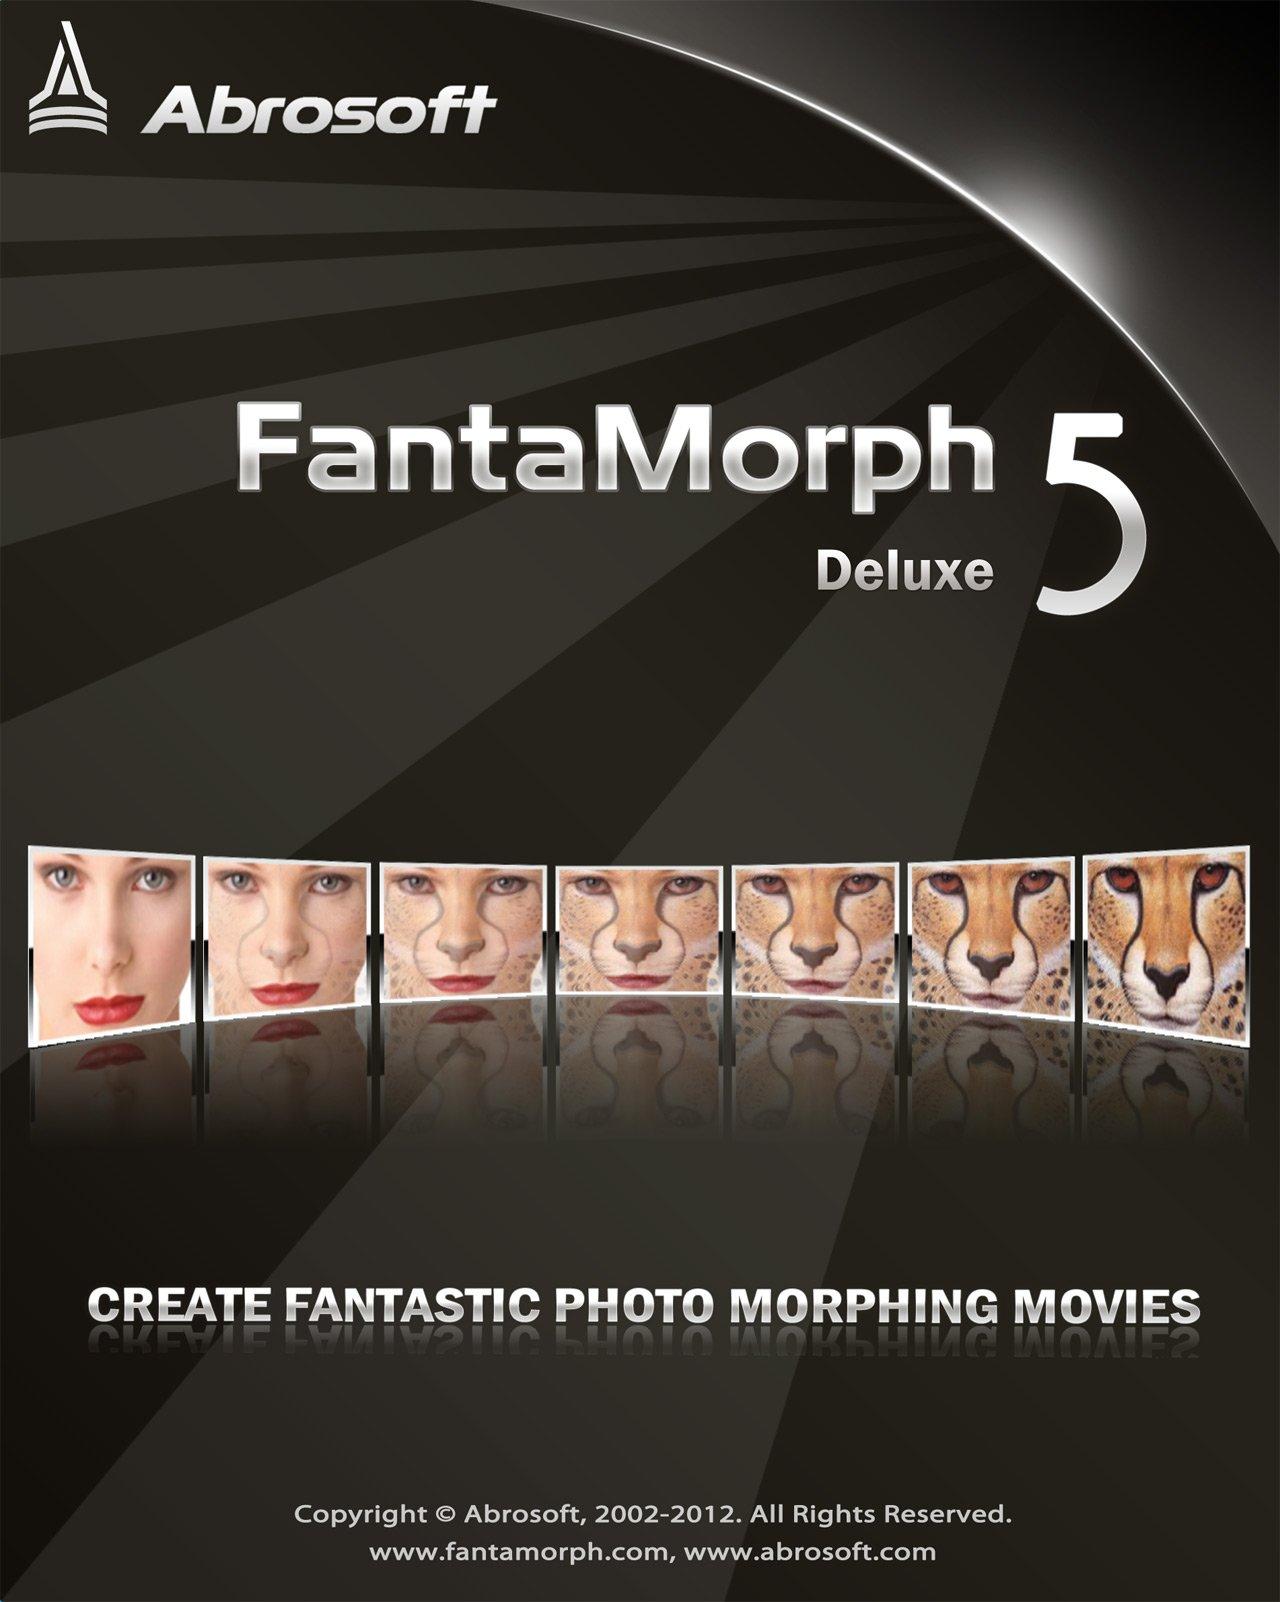 Abrosoft FantaMorph Deluxe [Download] by Abrosoft